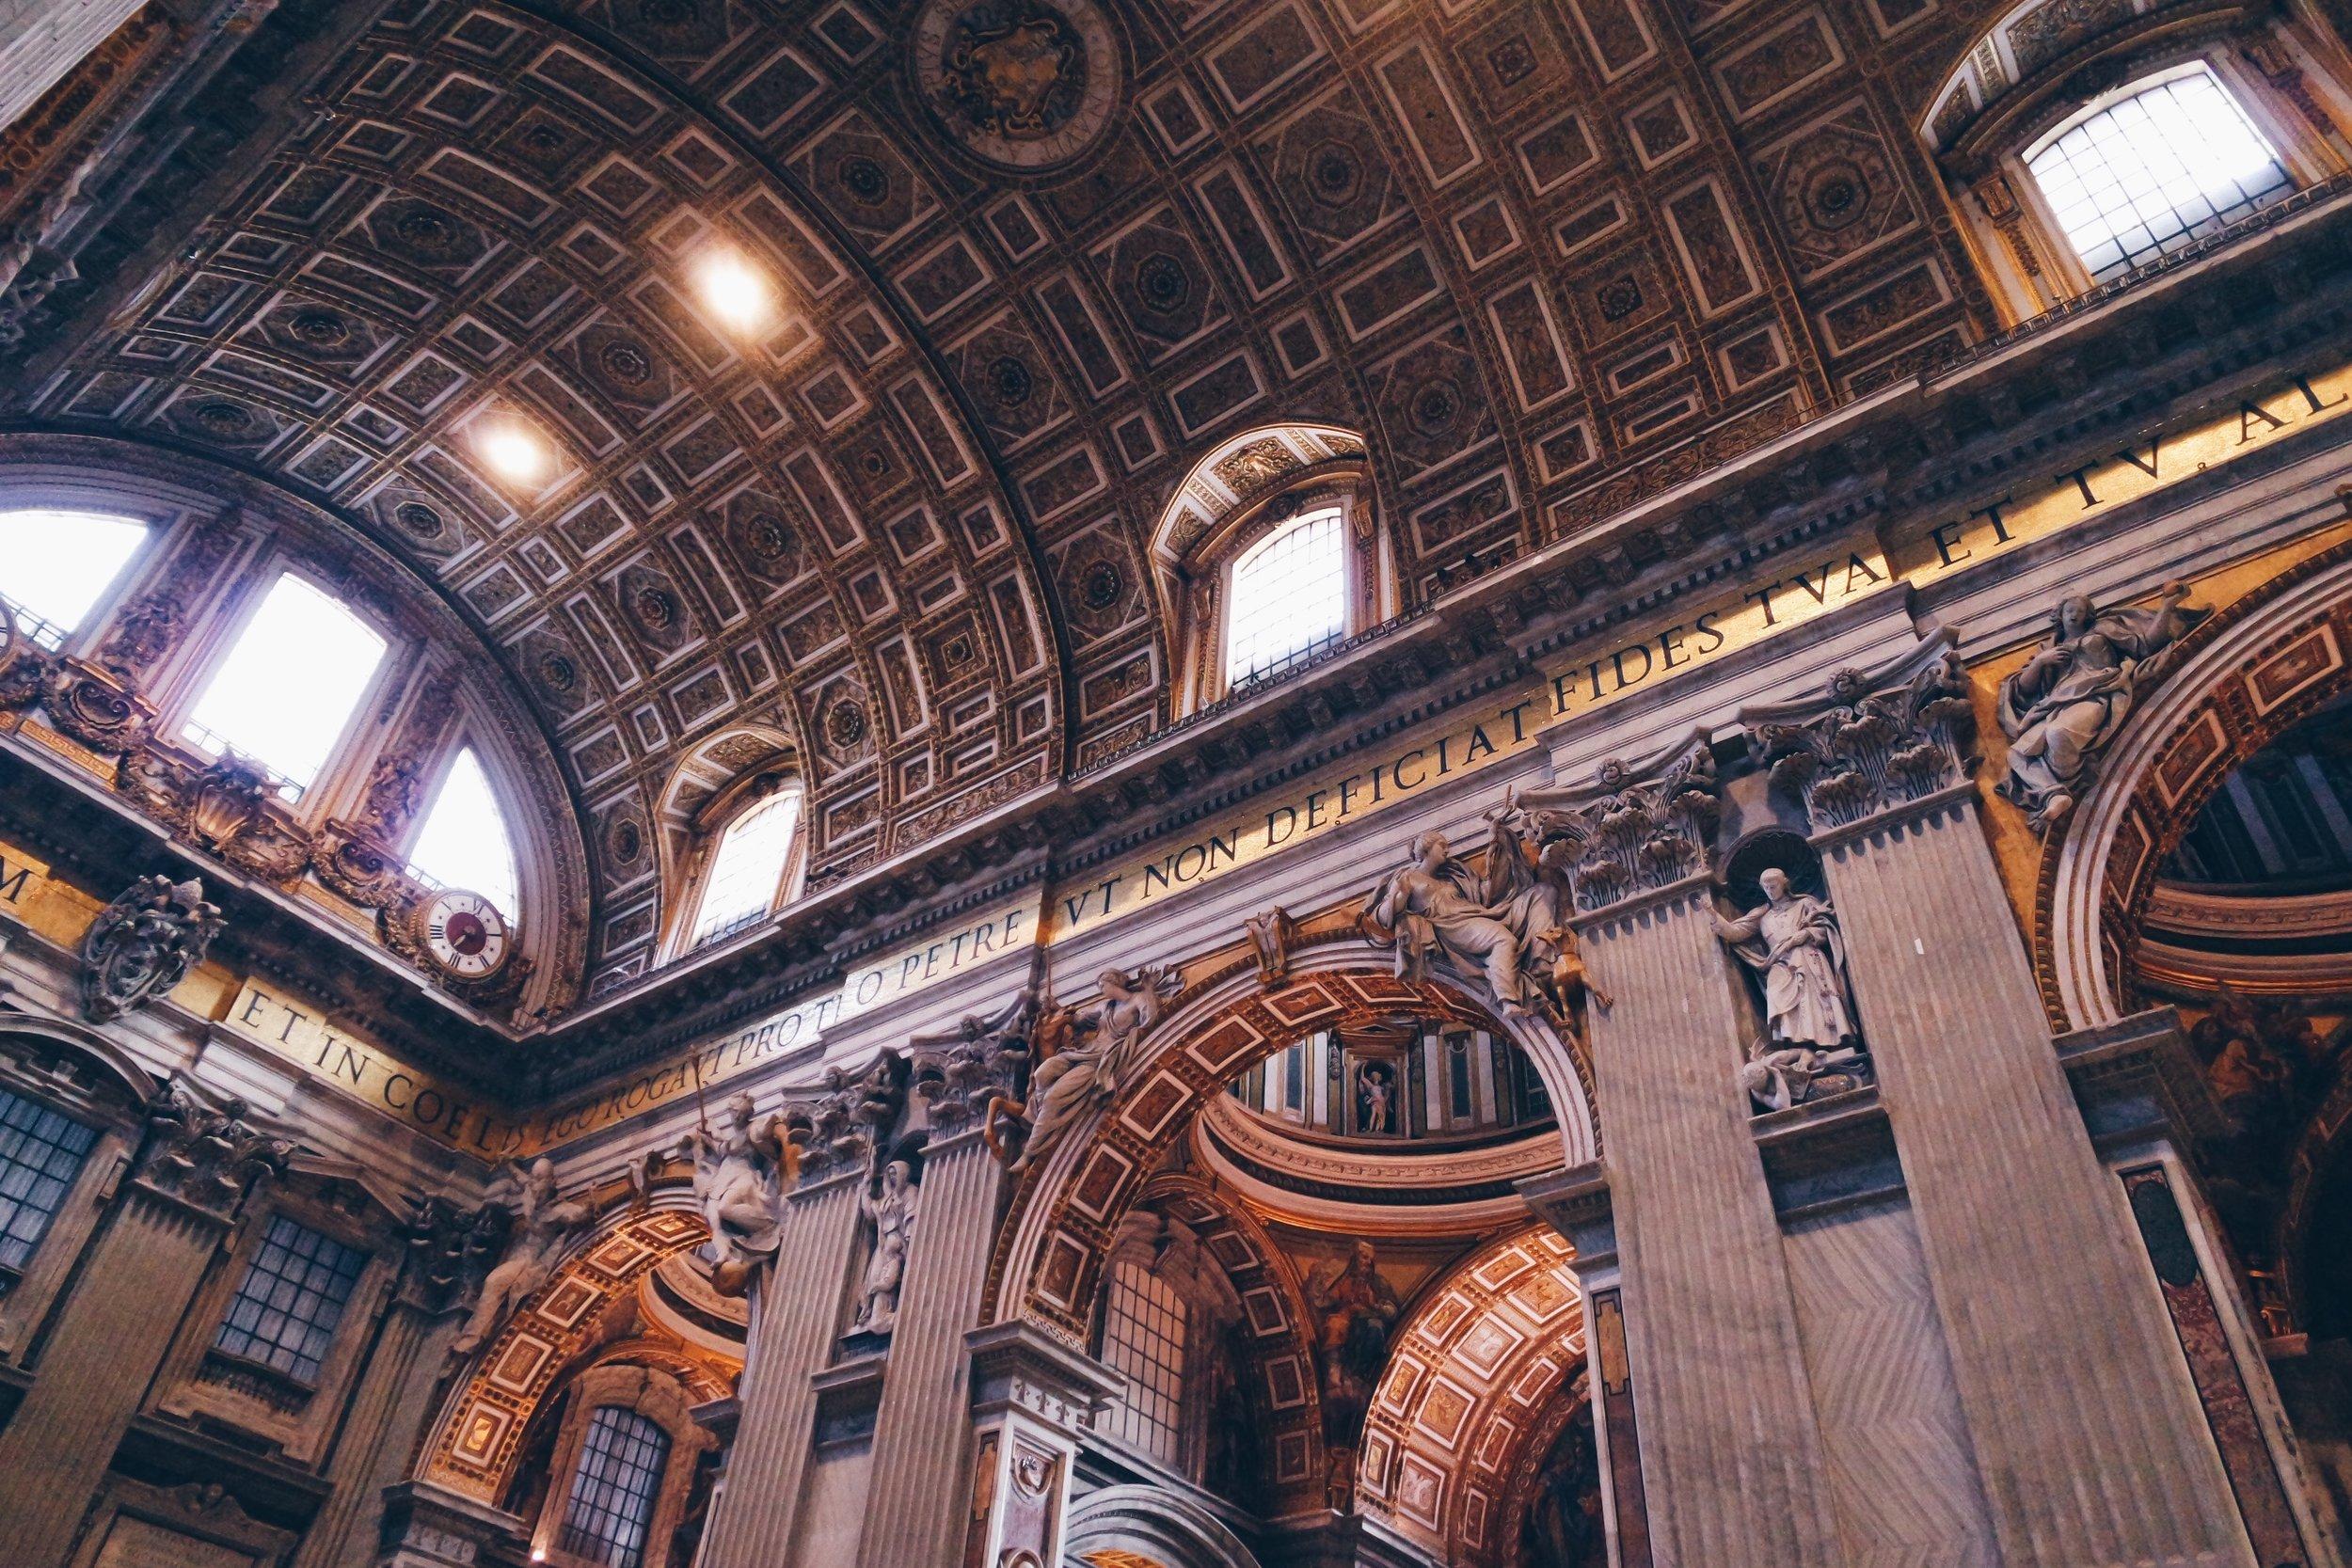 ceiling st peter basilica rome italy.JPG